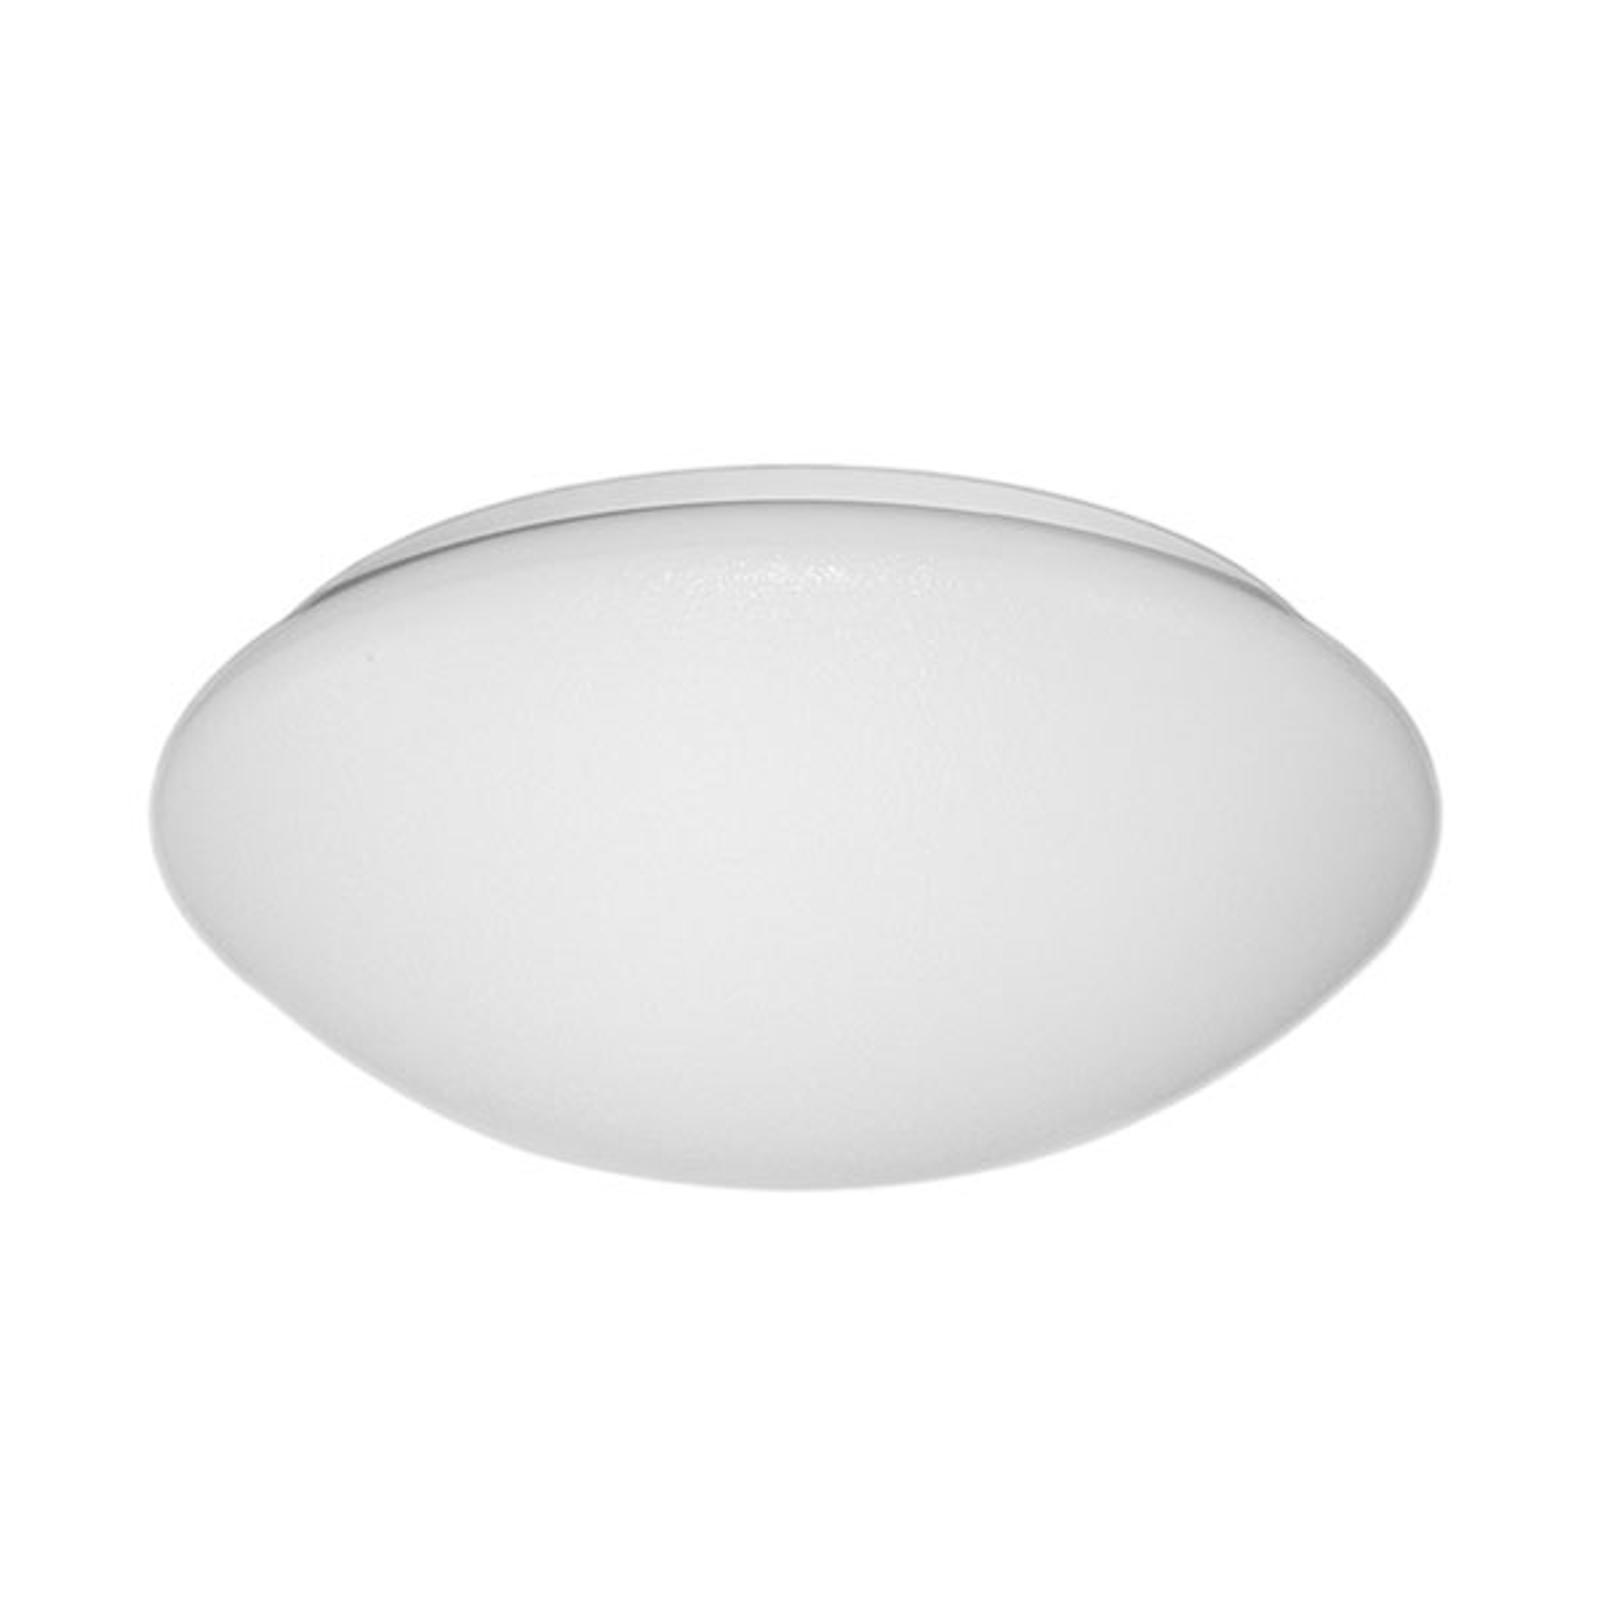 Lampa sufitowa LED, odporna, 27W, 4000 K